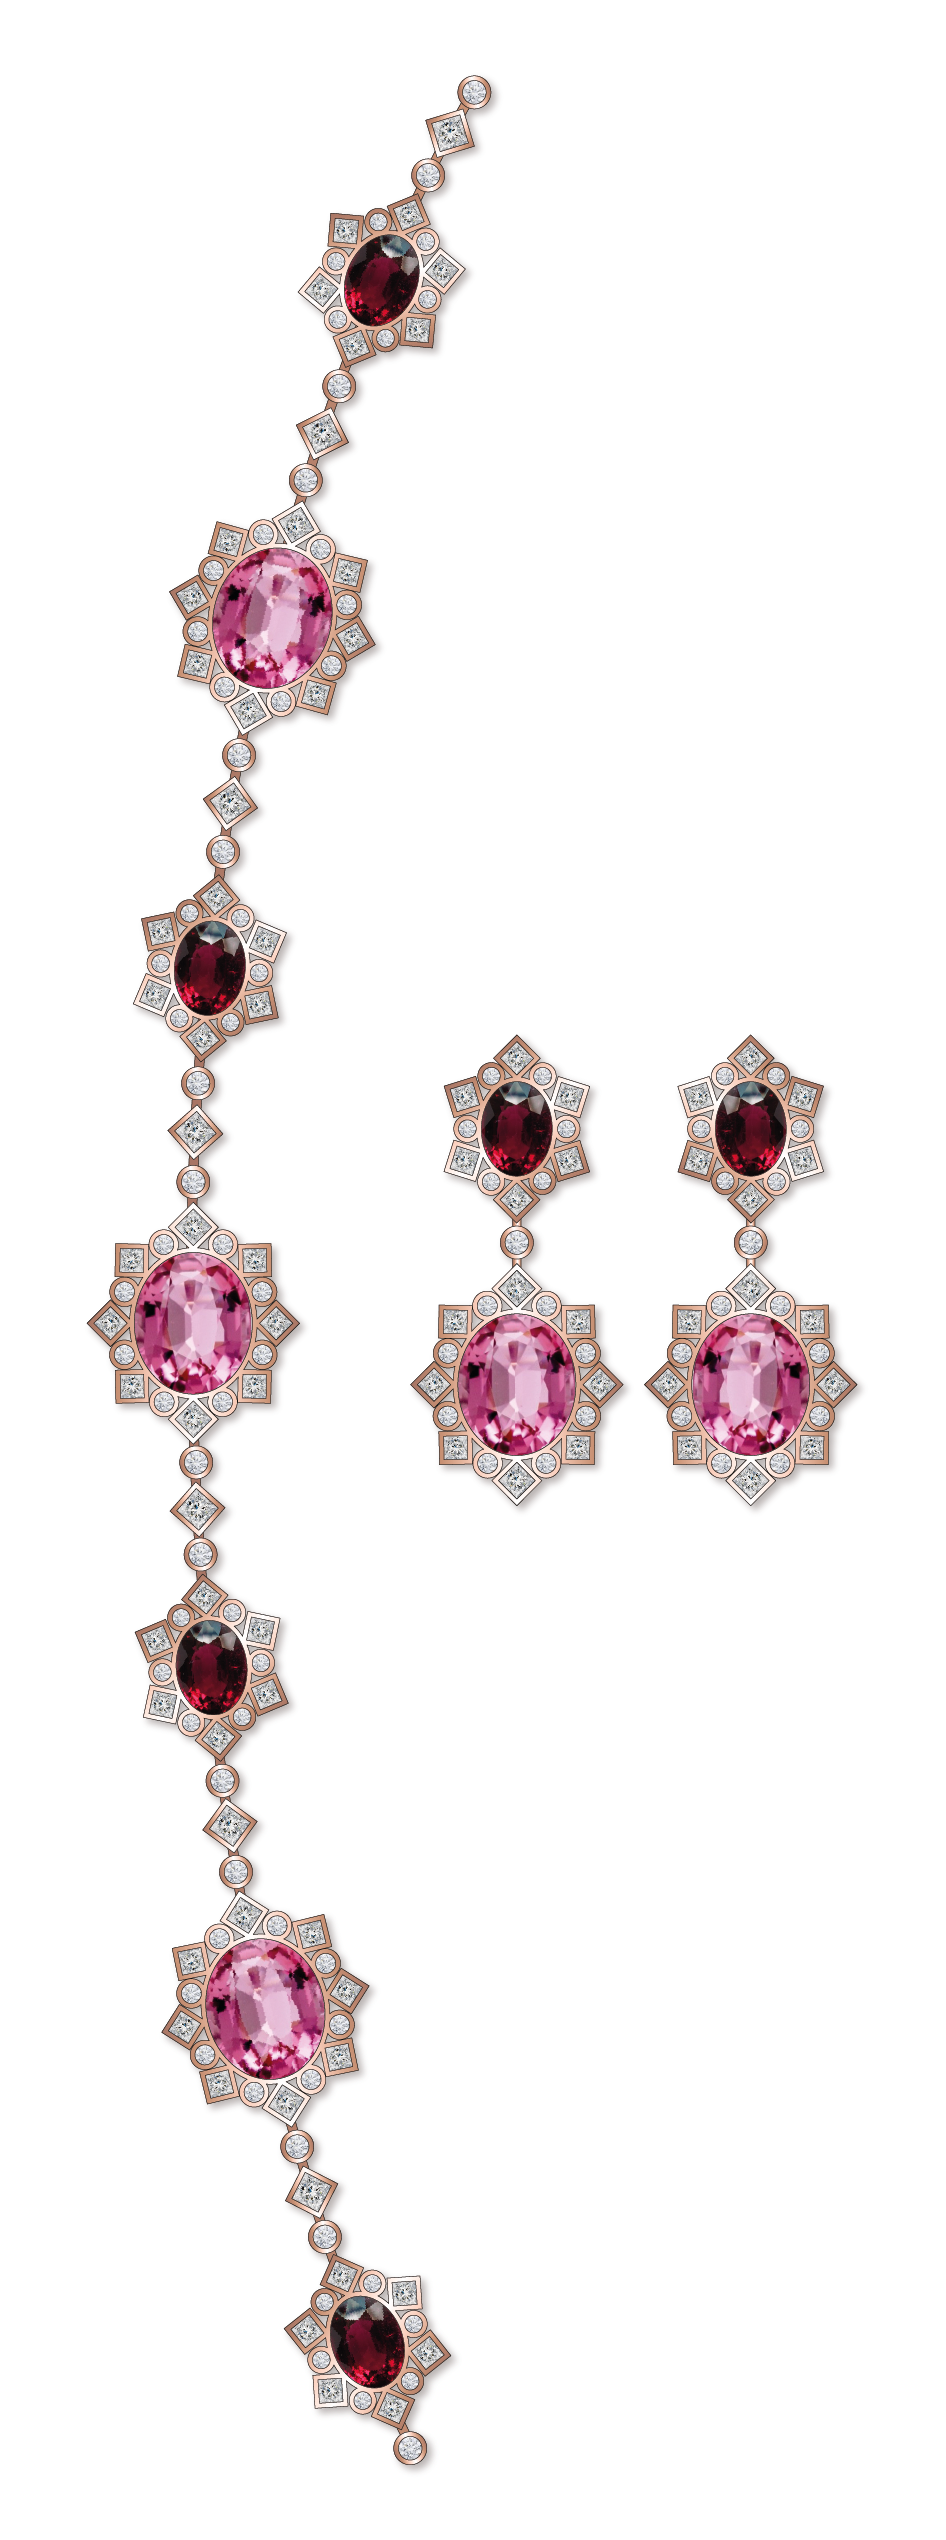 Dessin sautoir tourmalines roses rubellites diamants